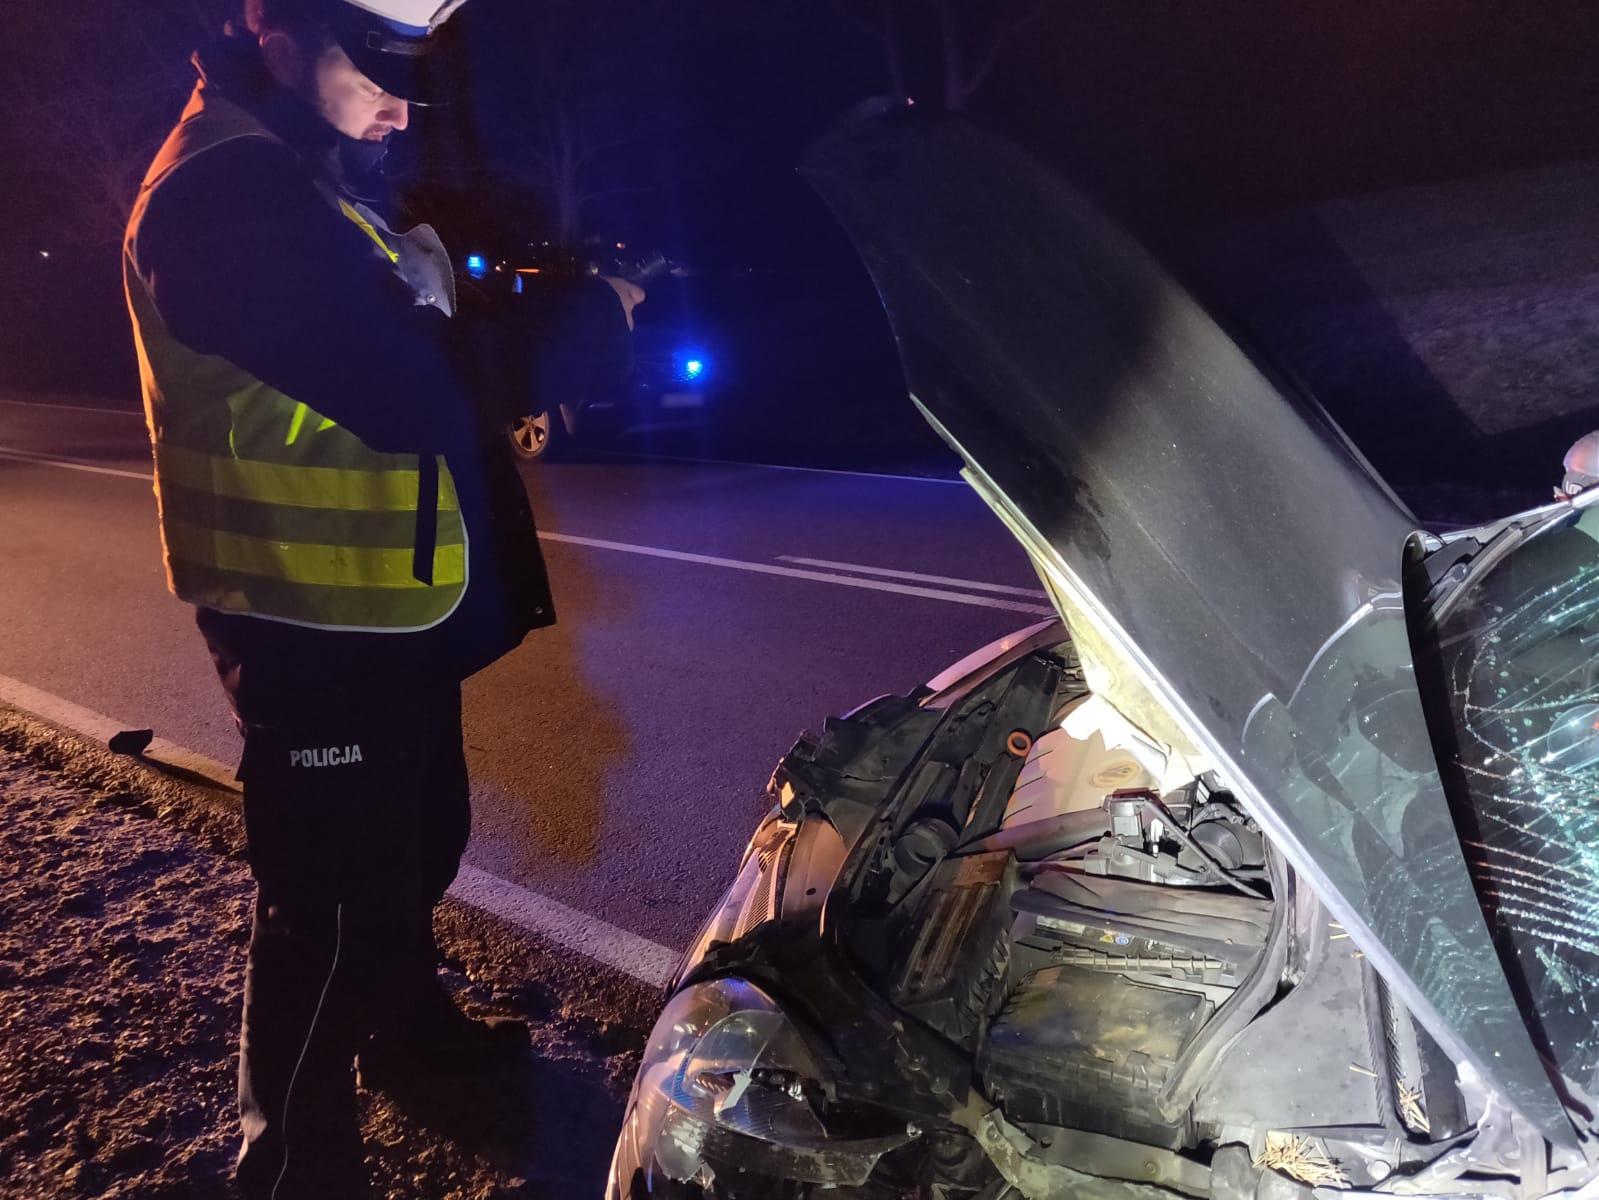 http://m.wm.pl/2019/02/orig/0000010643-1-miejsce-wypadku-531812.jpg